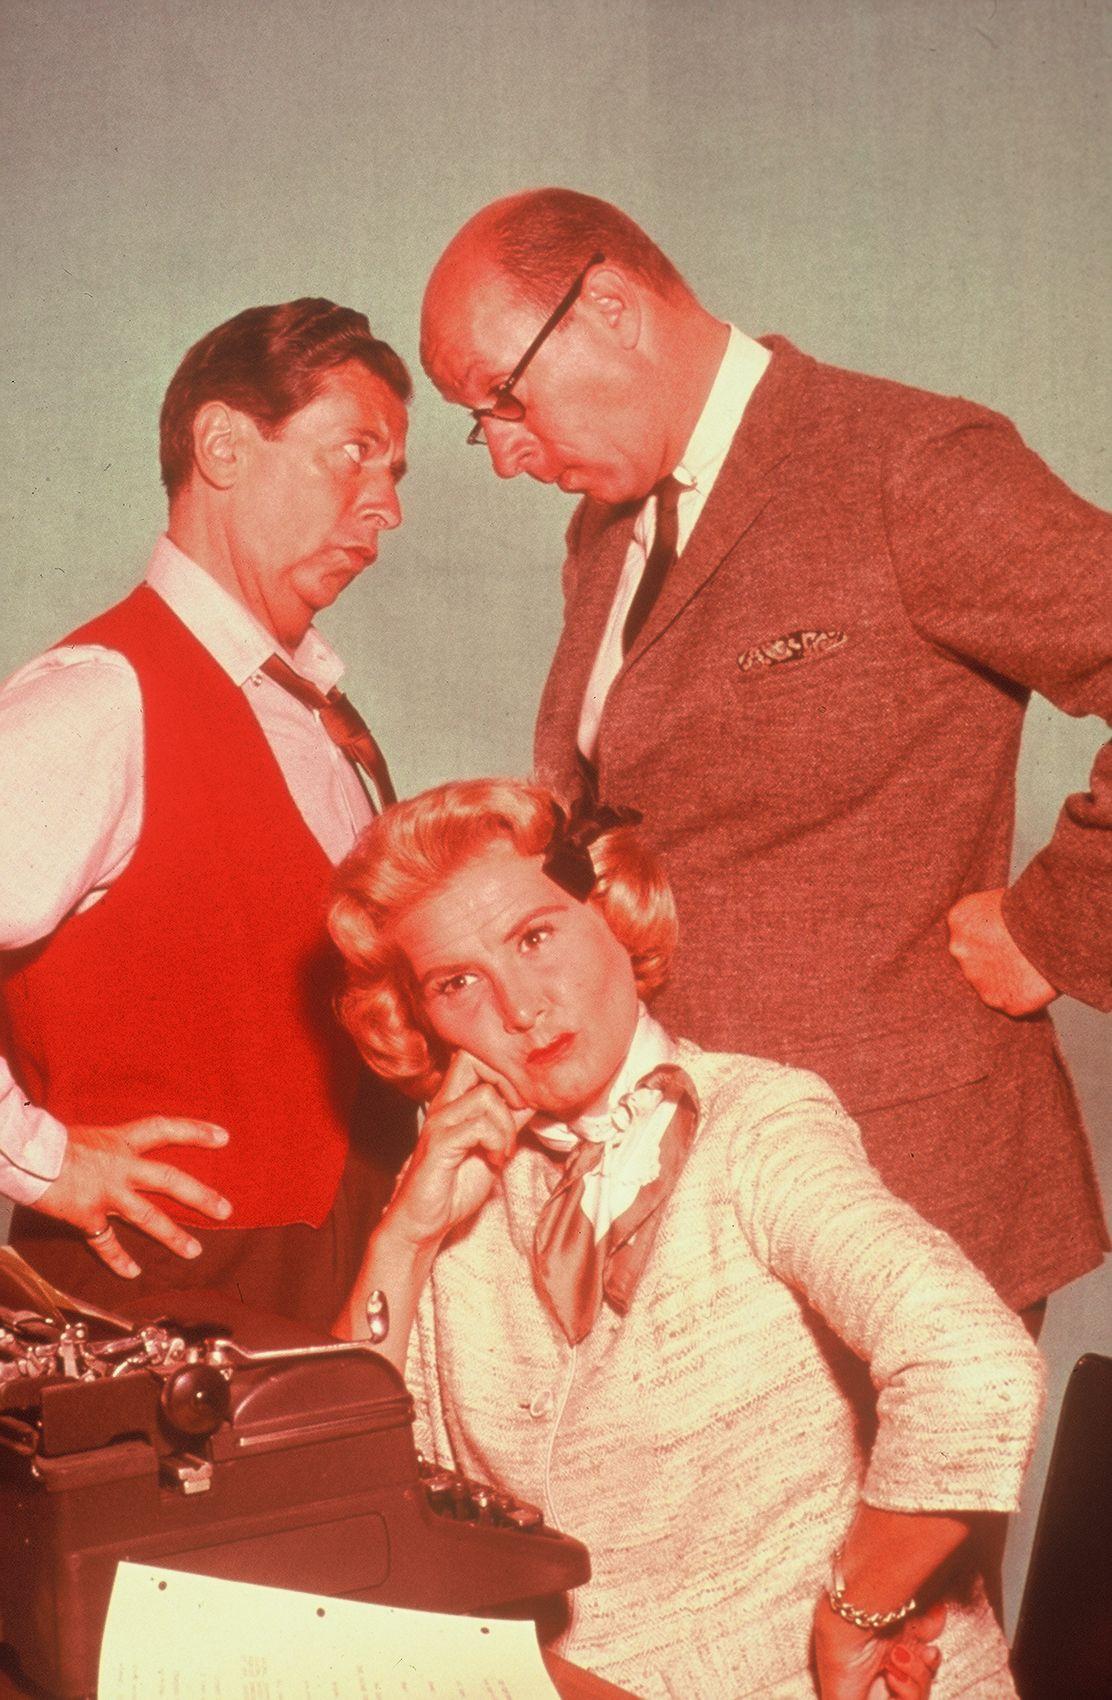 The Dick Van Dyke Show (1961 - 1966) A TV Land Classic